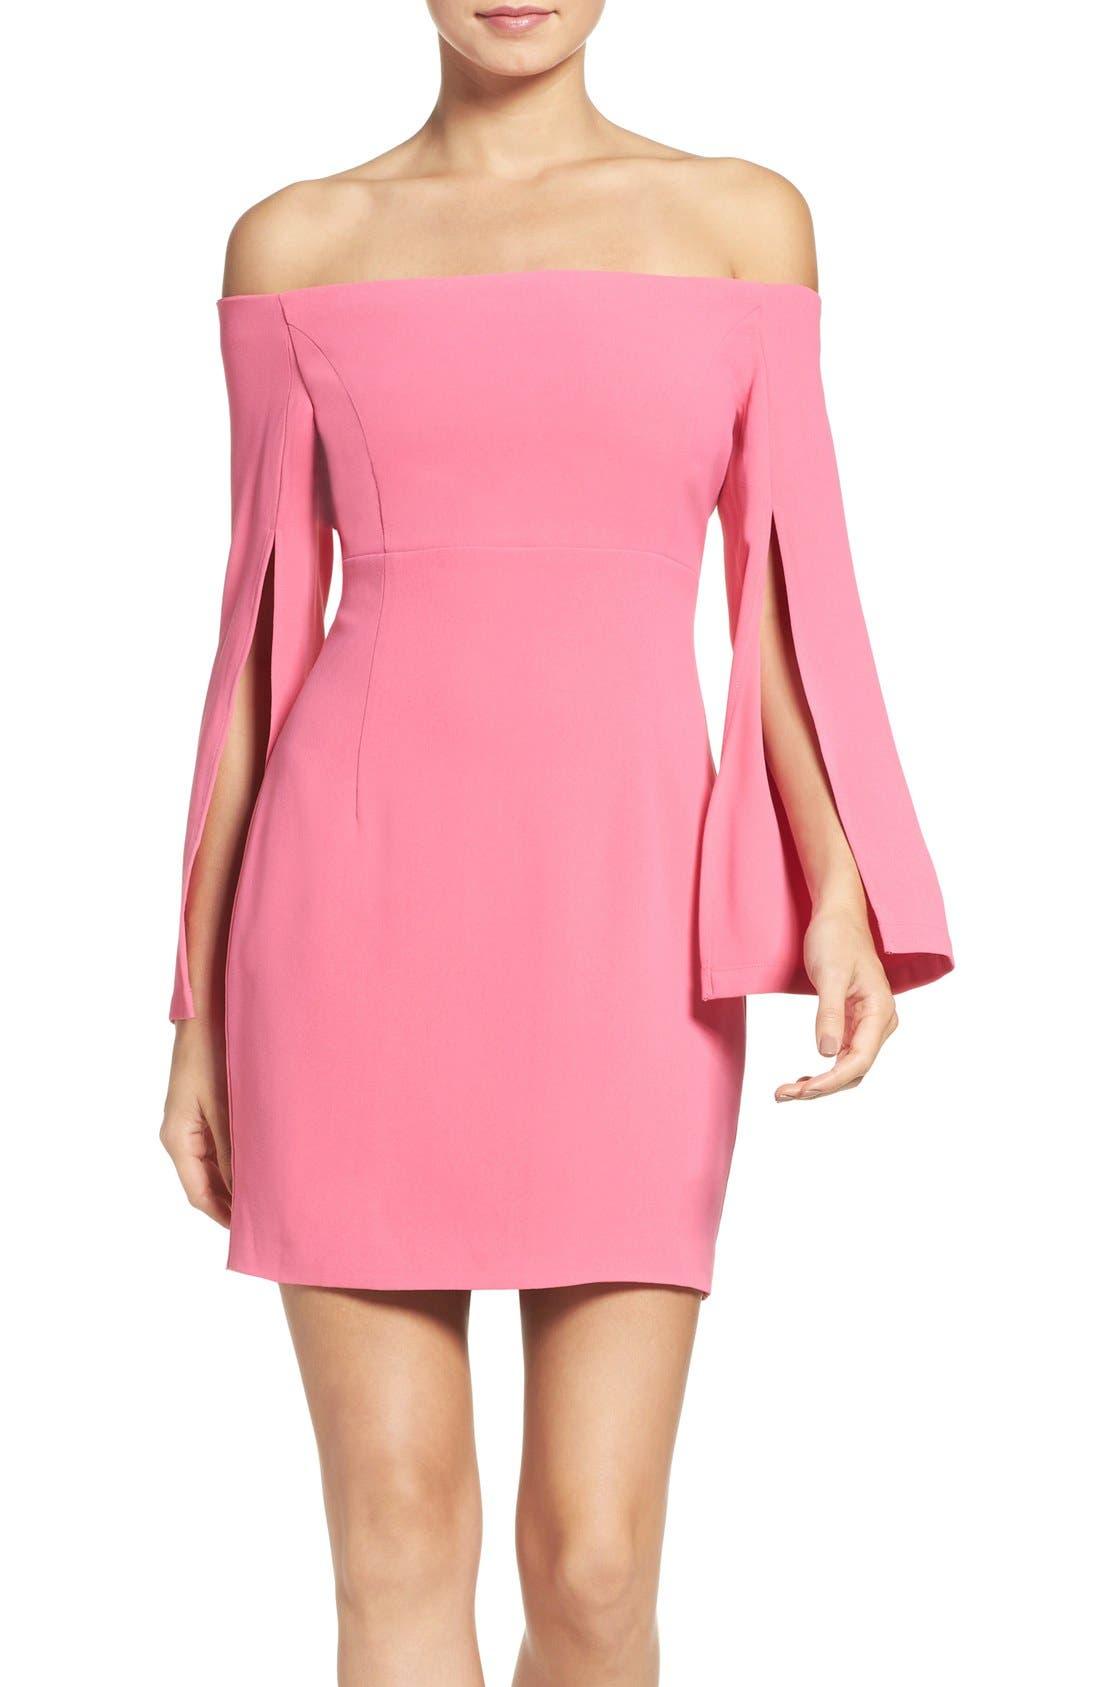 Ava Off the Shoulder Dress,                         Main,                         color, Tulip Pink